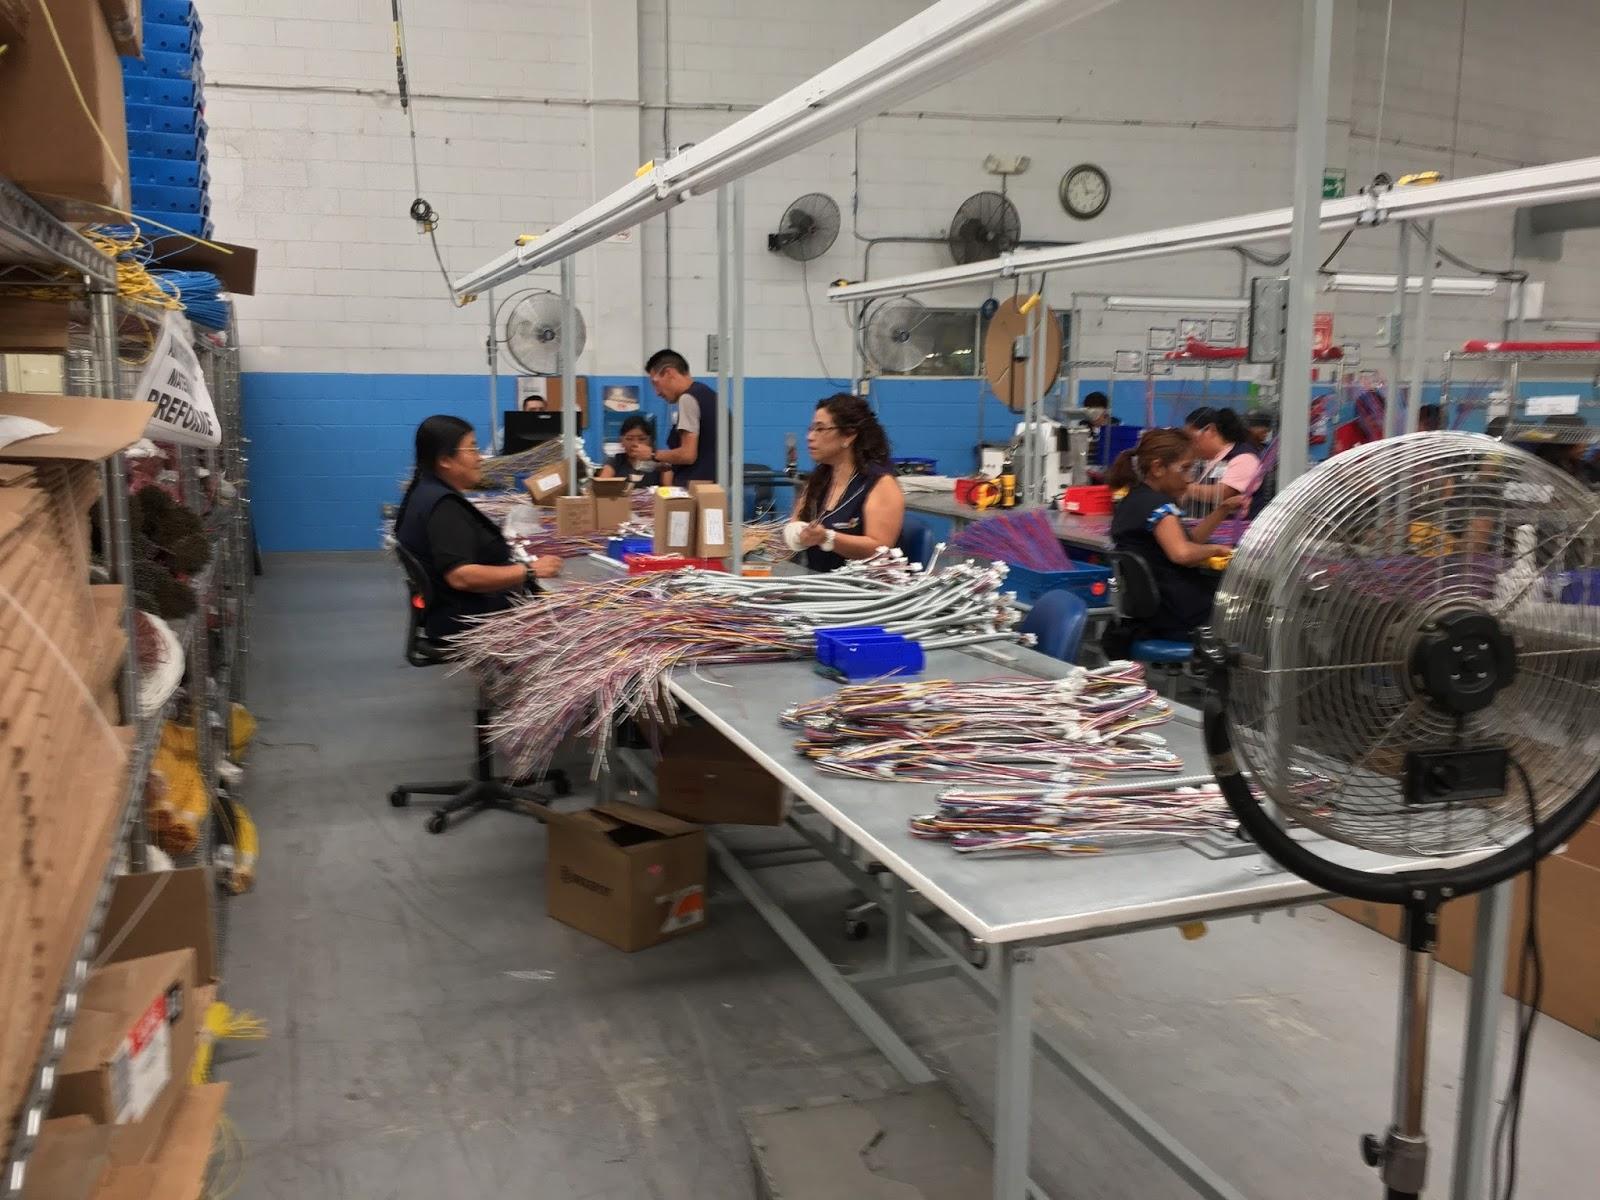 wire harness manufacturing facility mexico mea vita carpe diem tijuana manufacturing for kickstater #2